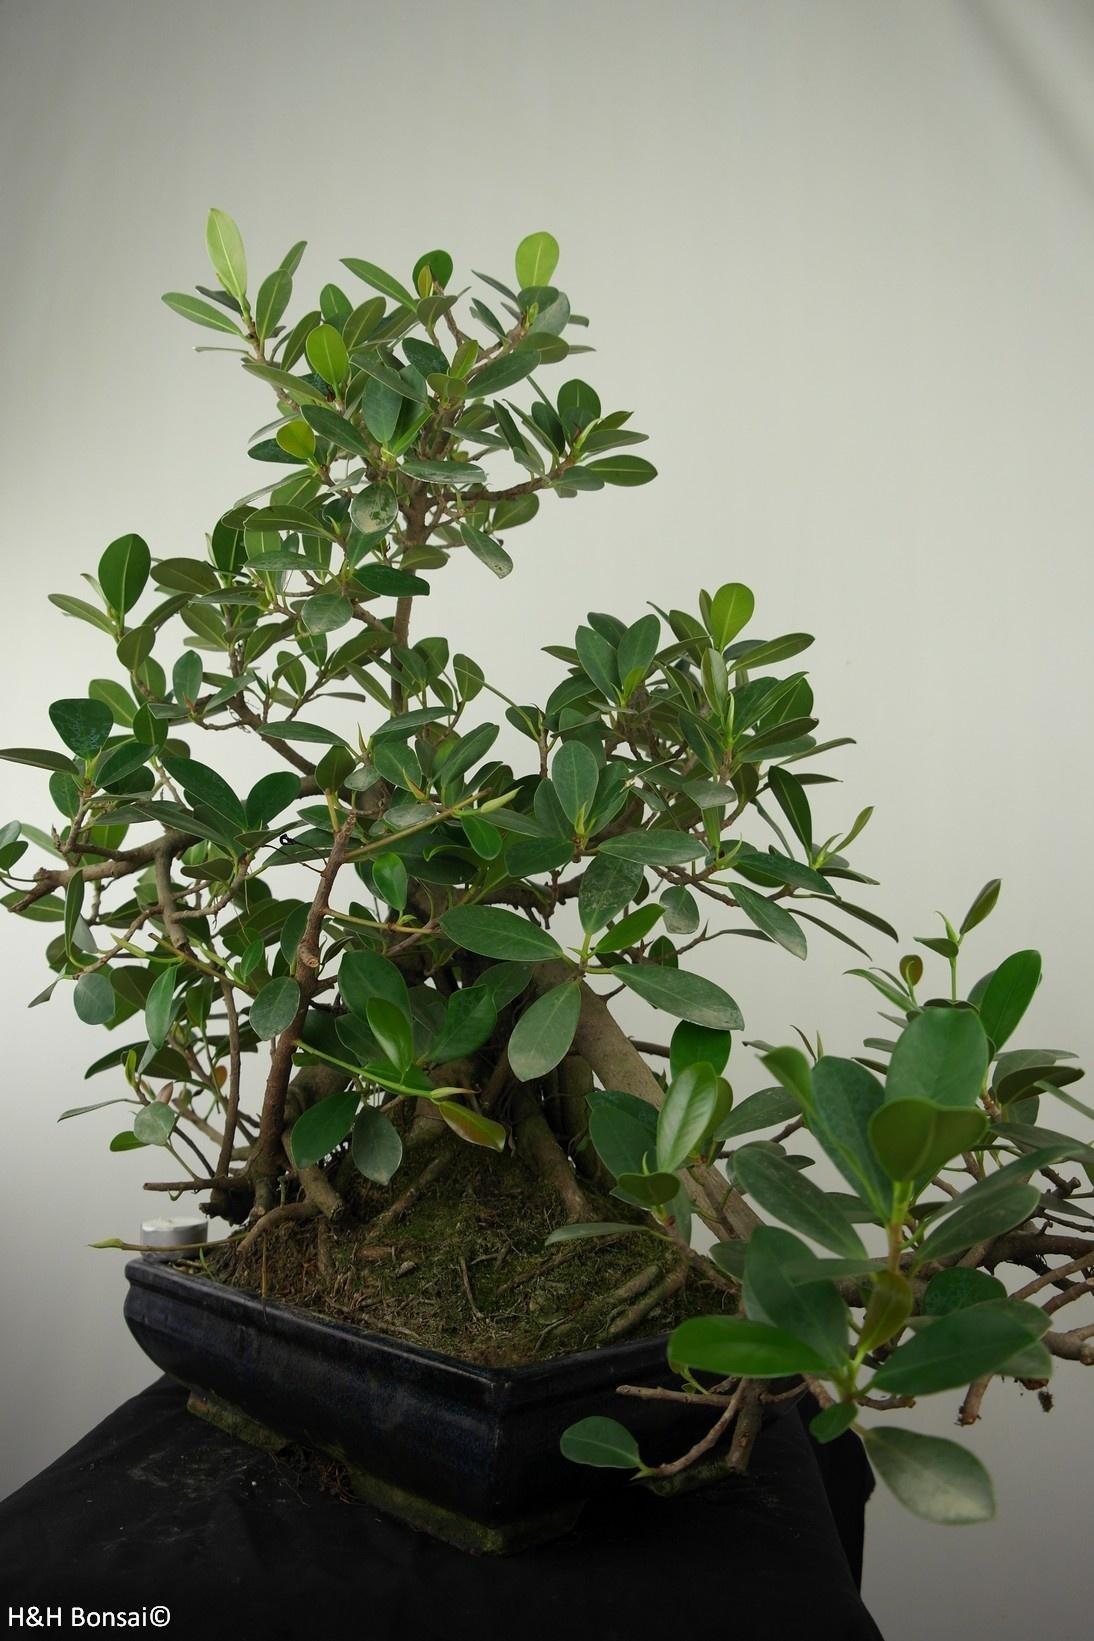 Bonsai Kleinblättriger Gummibaum, Ficus microcarpa panda, nr. 7681